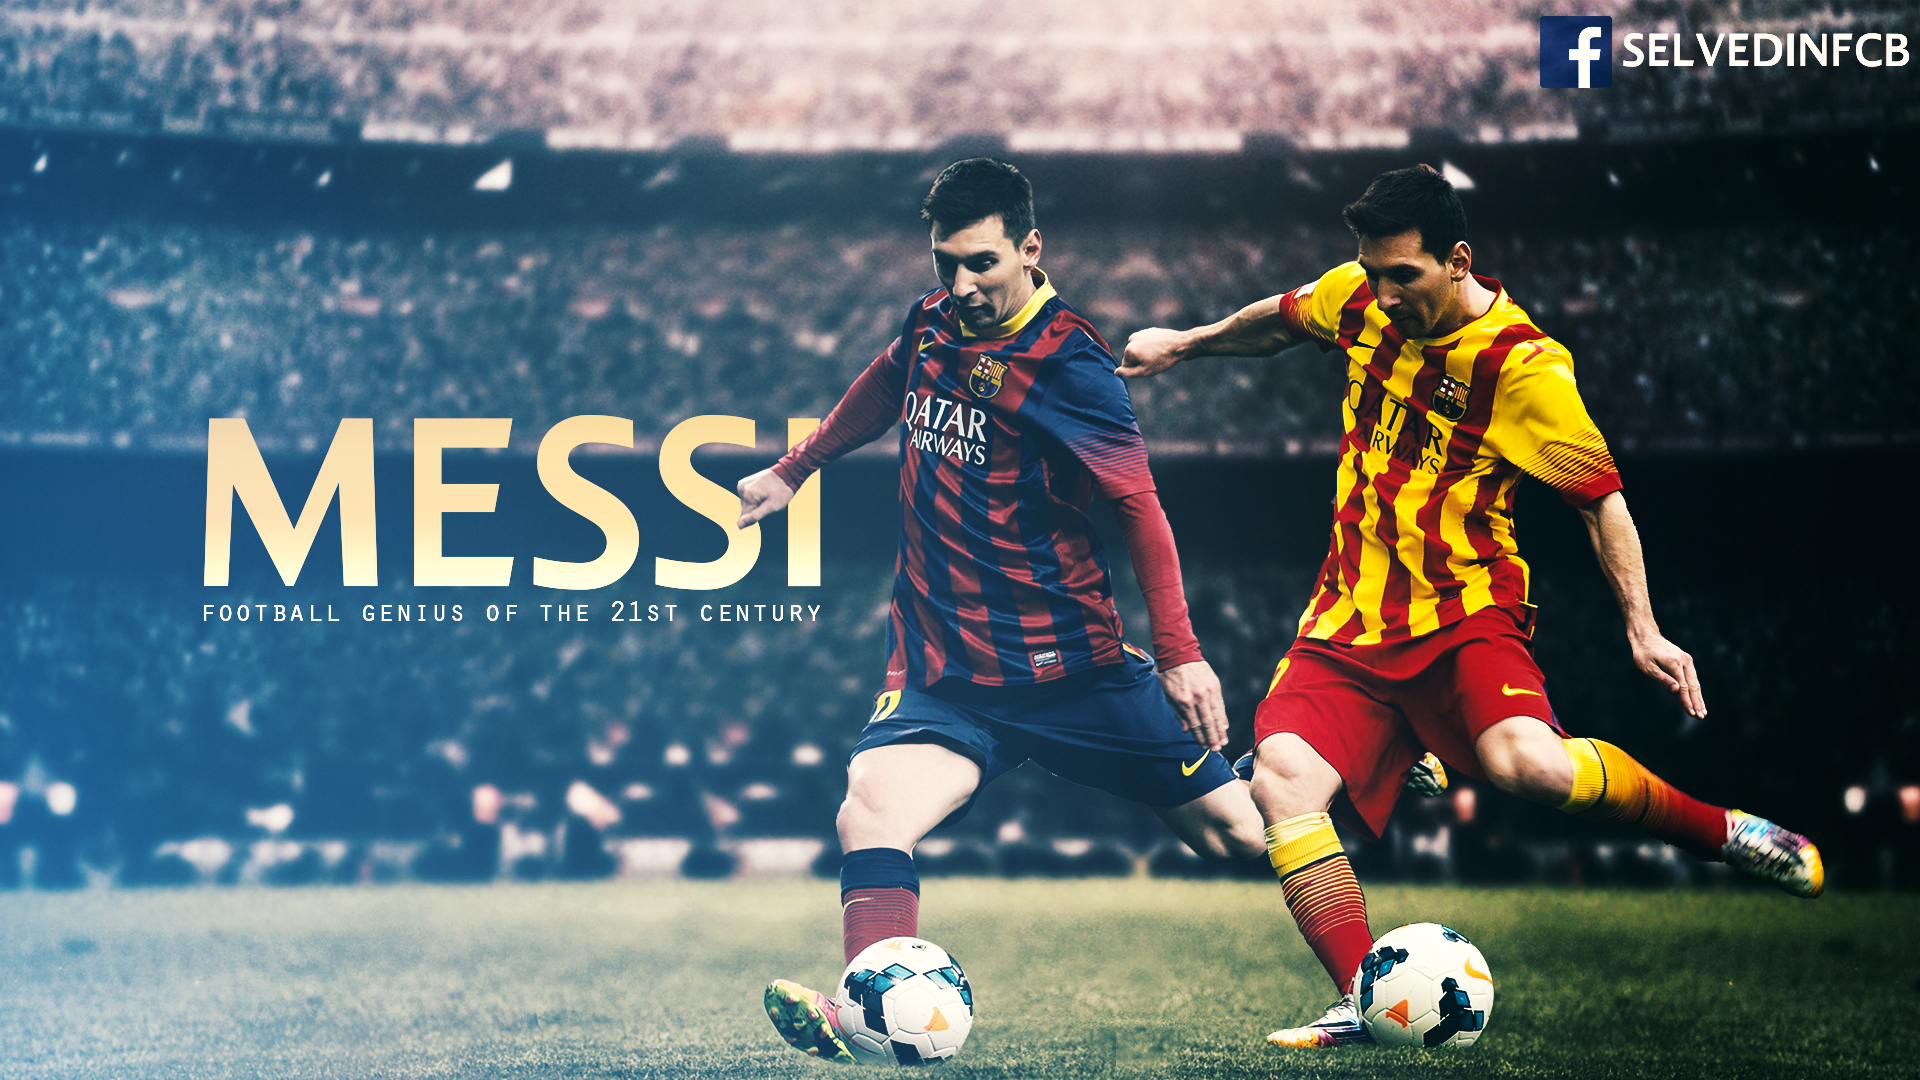 Lionel Messi Wallpaper HD 2014 download Wallpaper Area HD 1920x1080